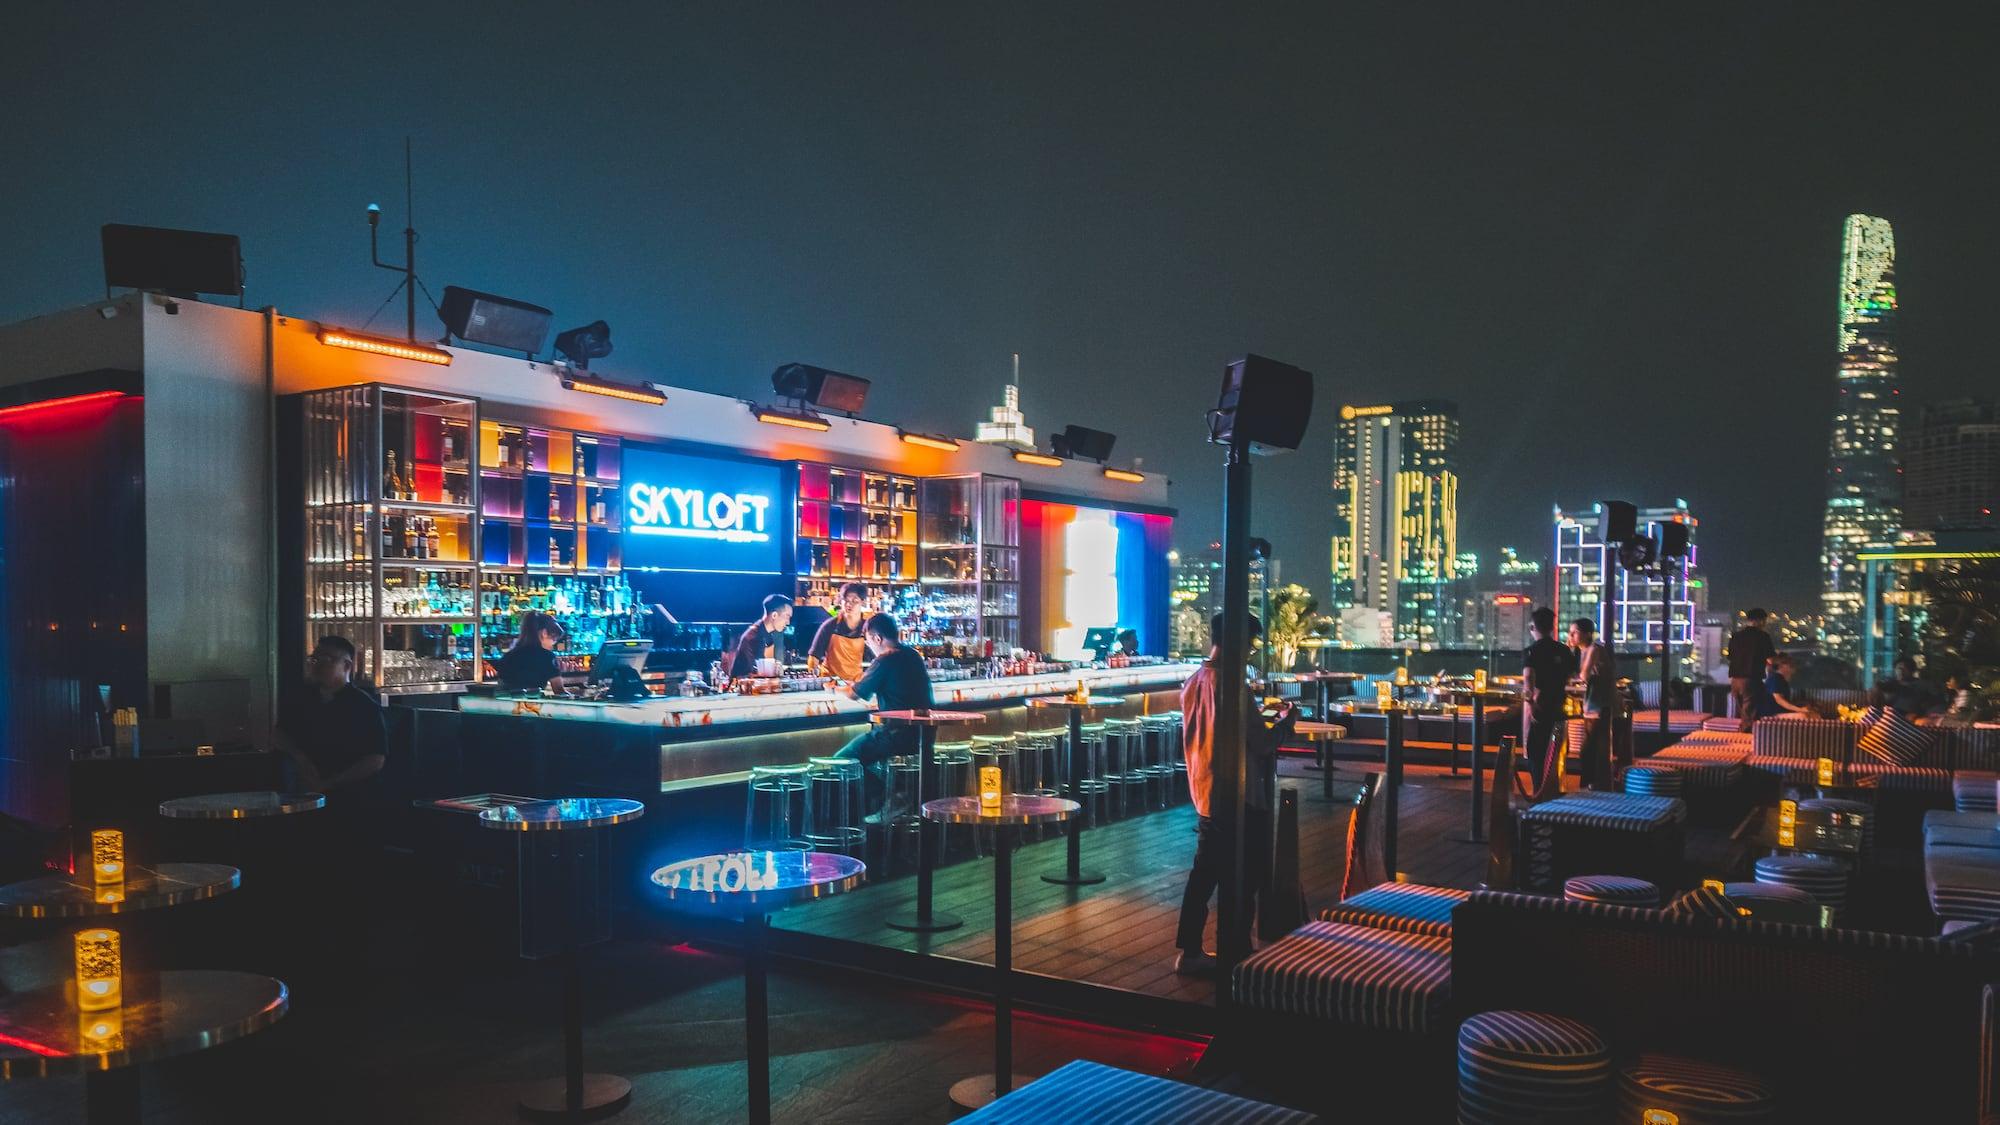 Skyloft By Glow On Elevating The Nightlife Scene In Saigon